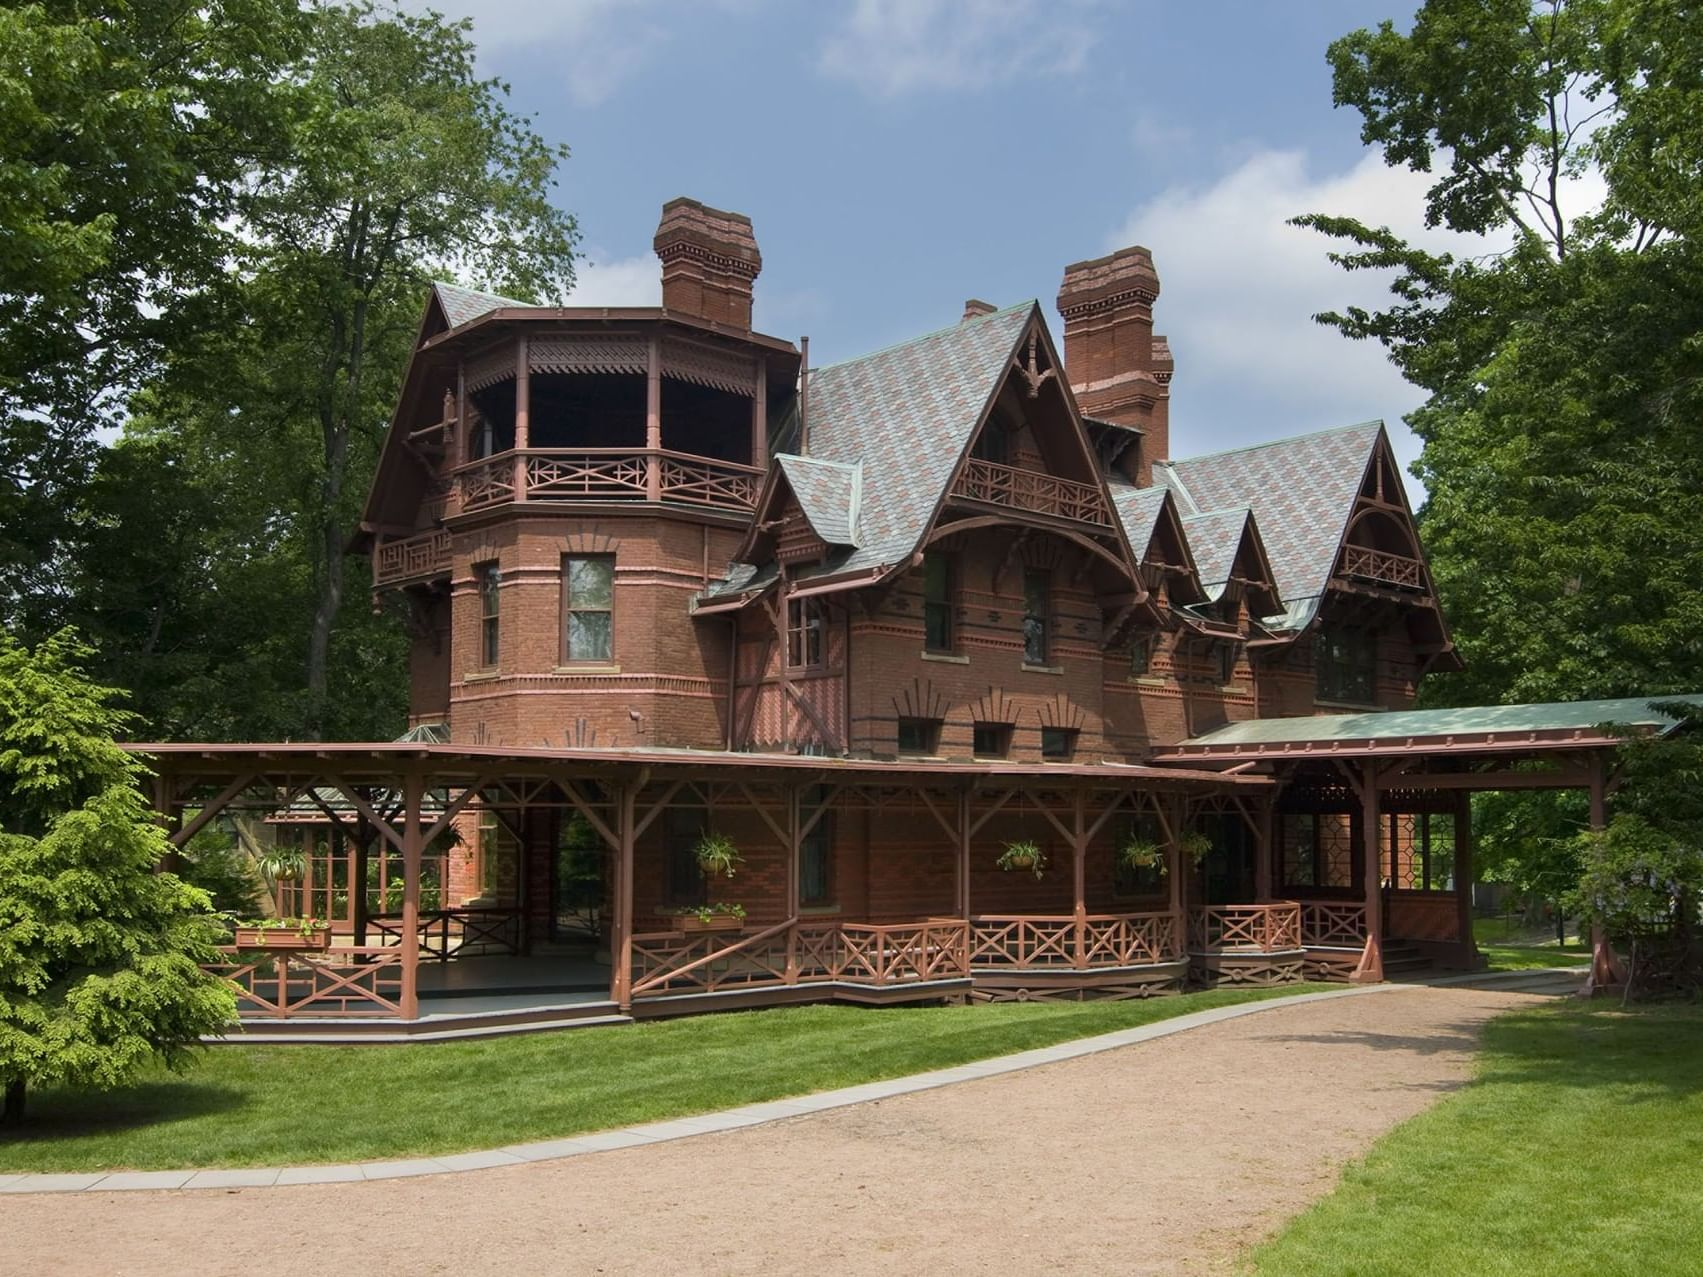 Exterior view of Mark Twain House near Avon Old Farms Hotel